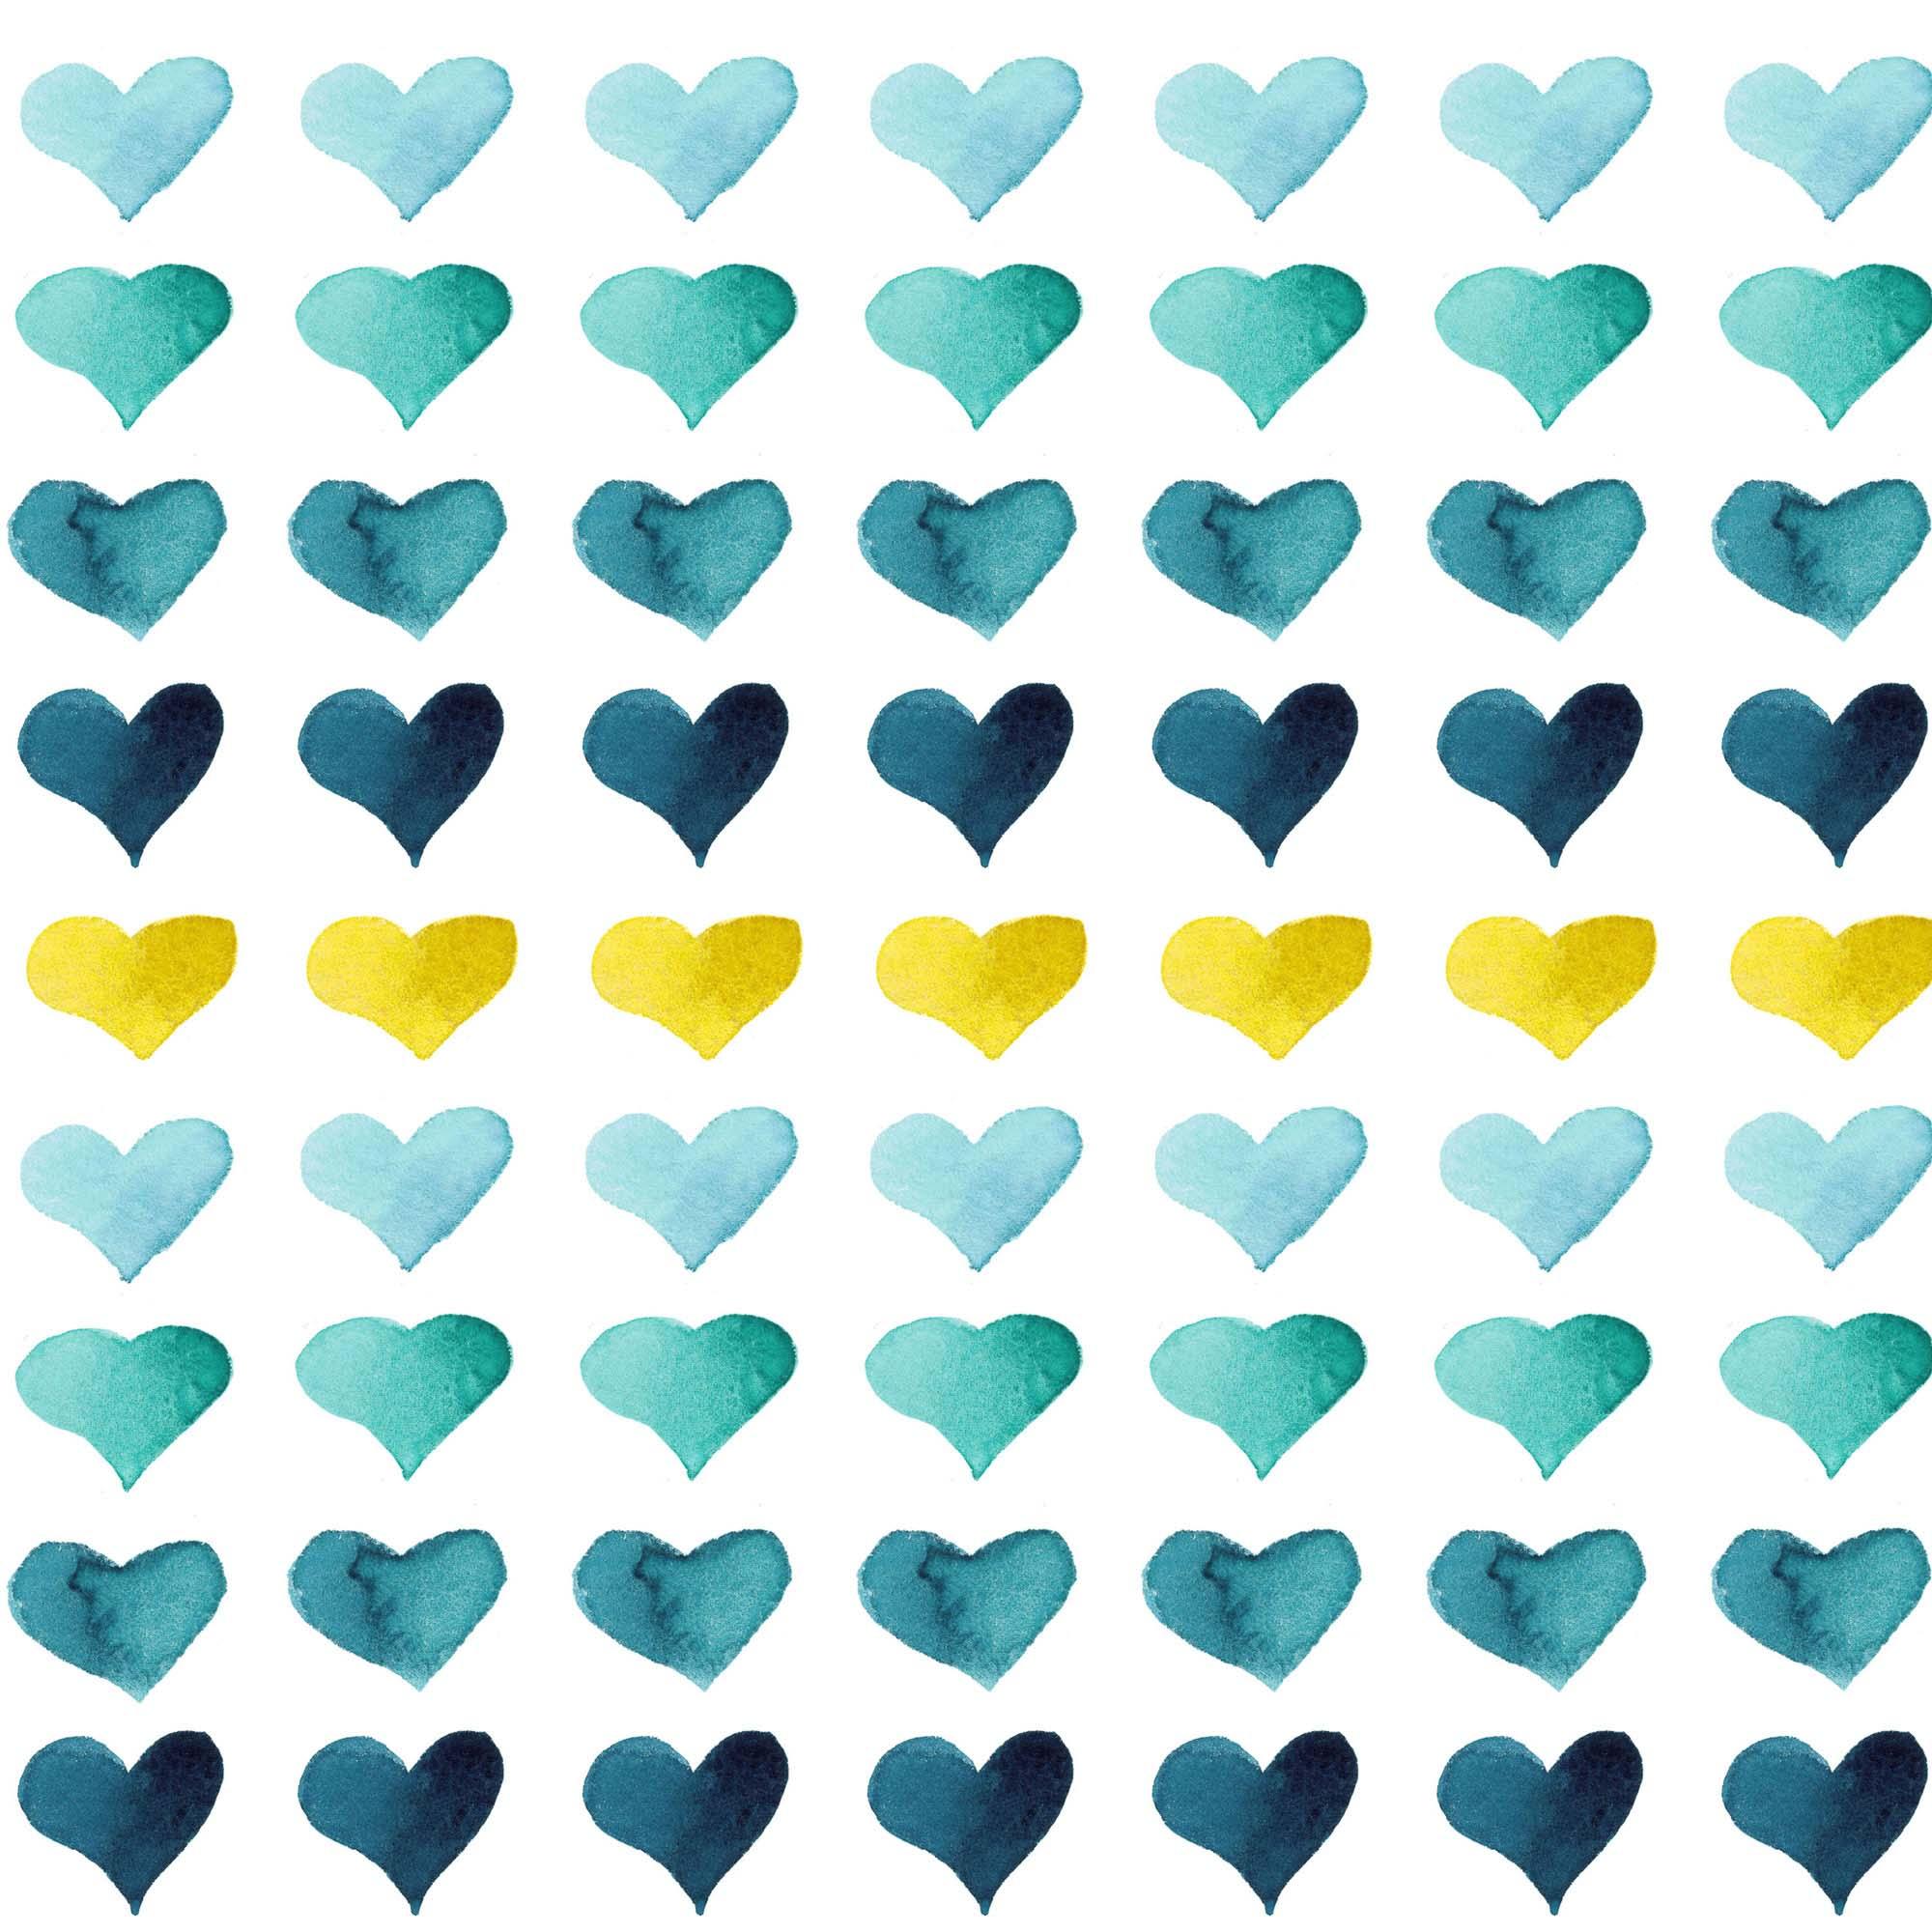 Hearts of the Sea blue & yellow watercolor heart print by Aliya Bora